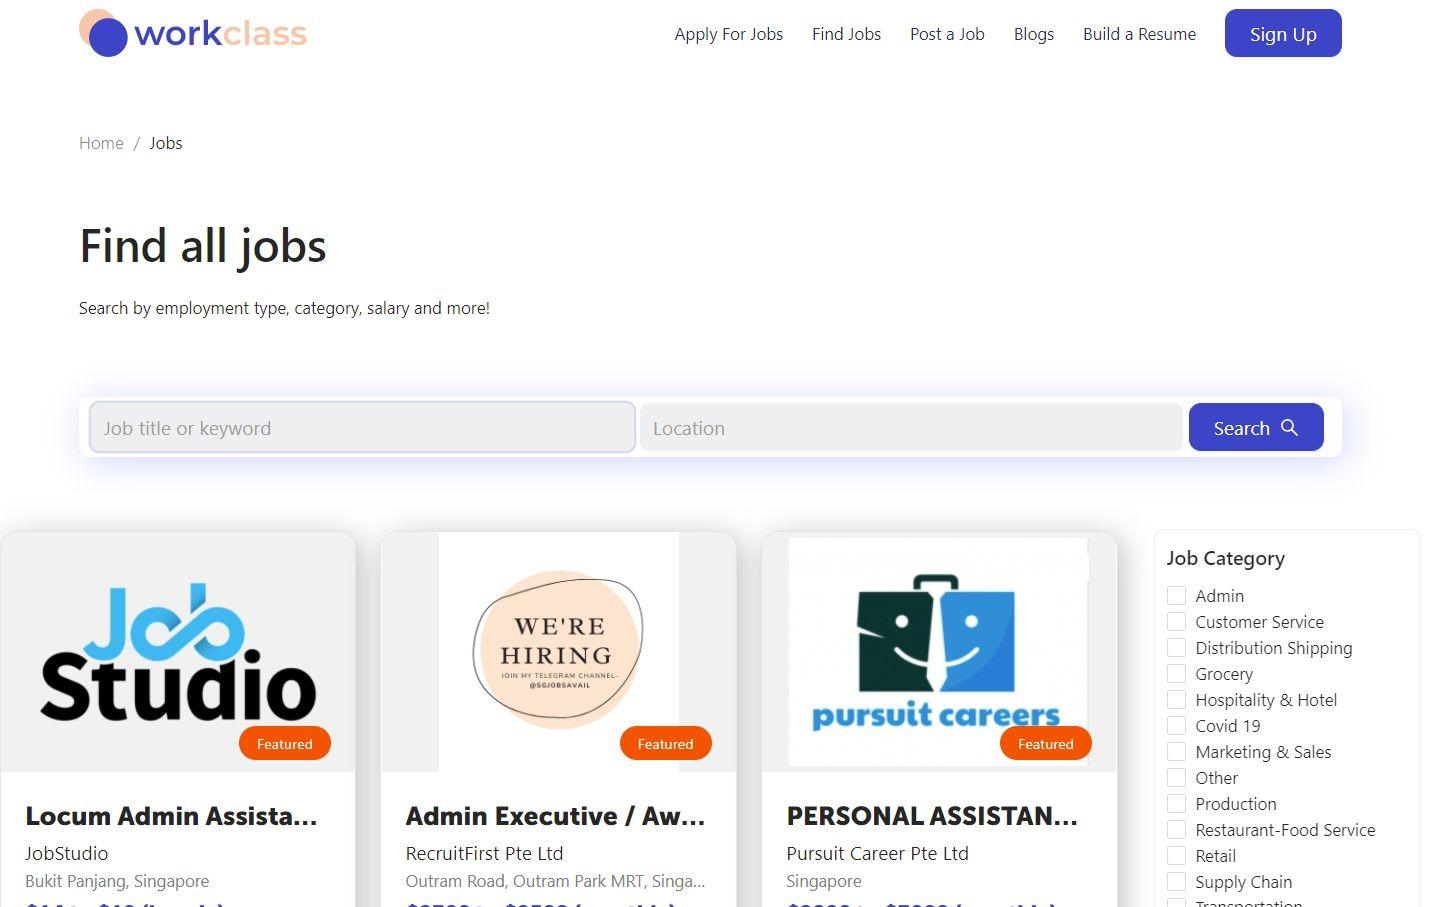 Workclass webpage